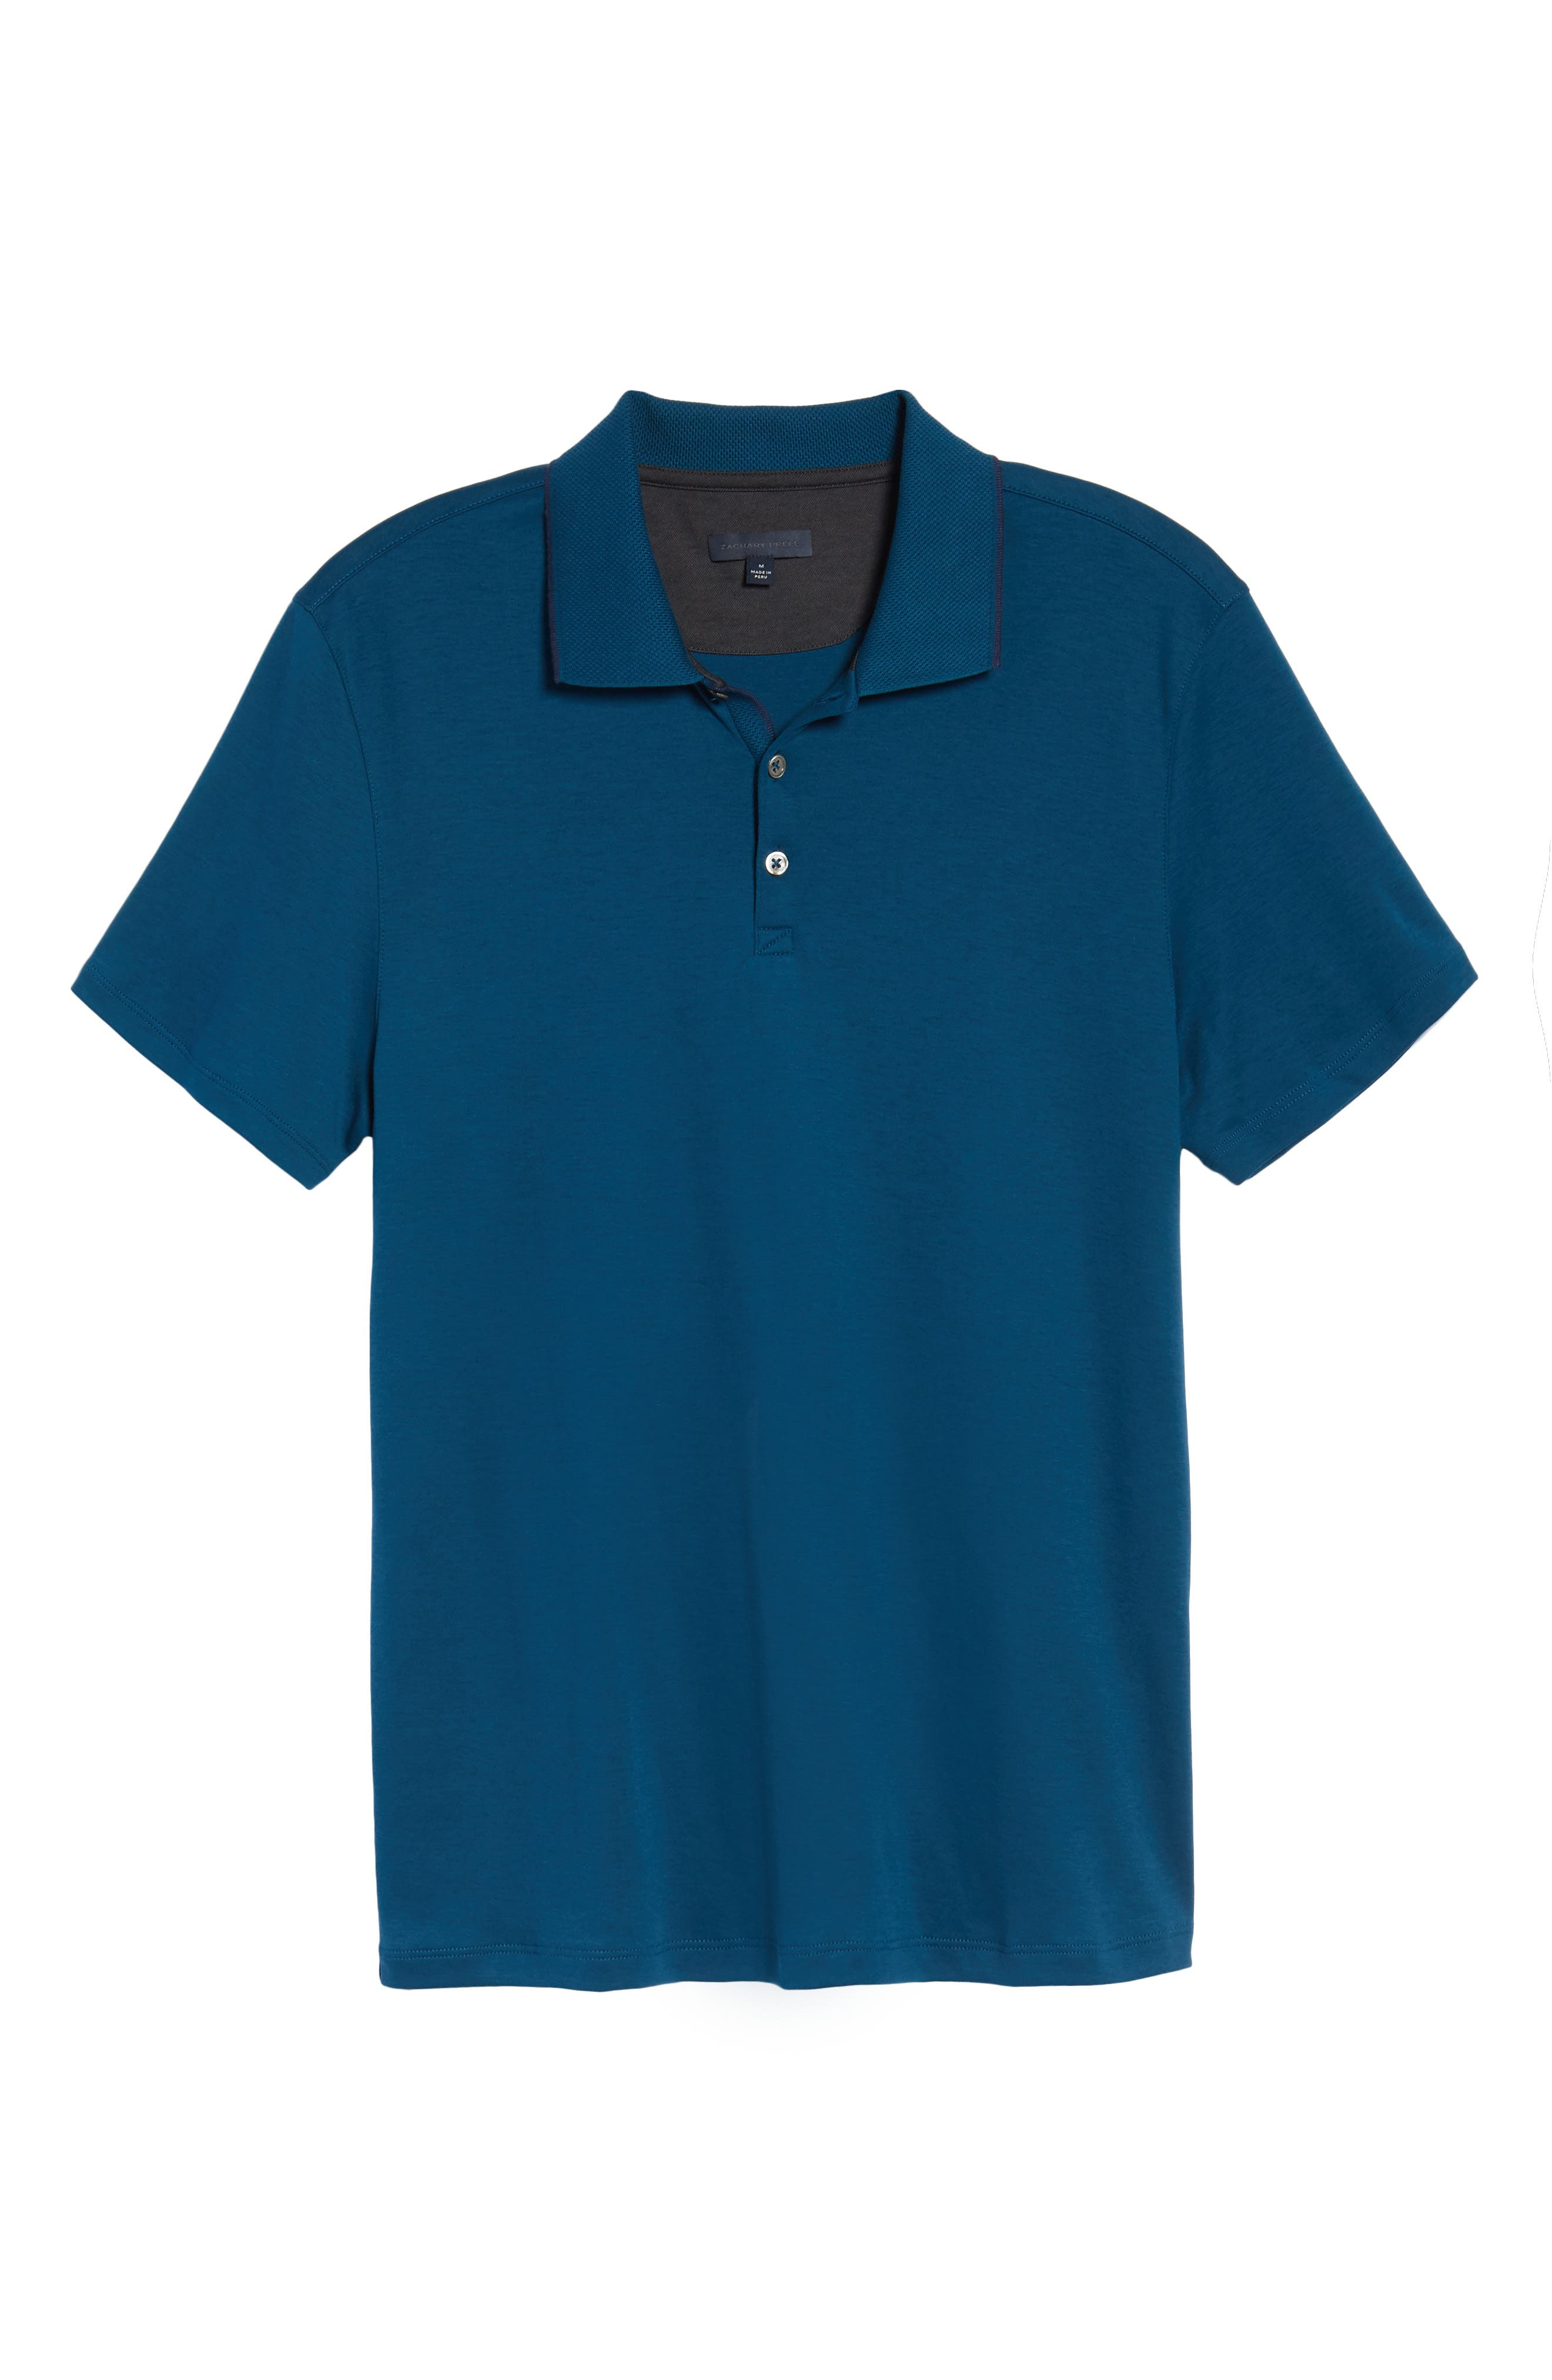 Grindstone Slim Fit Polo,                             Alternate thumbnail 17, color,